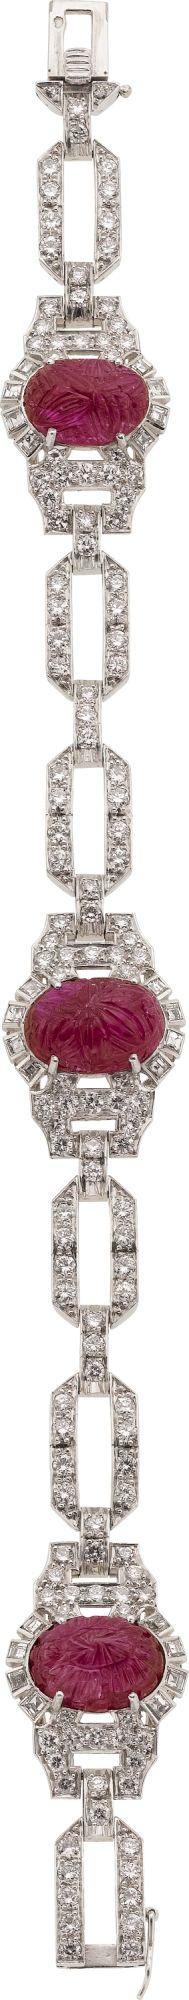 Art Deco Ruby, Diamond, Platinum Bracelet